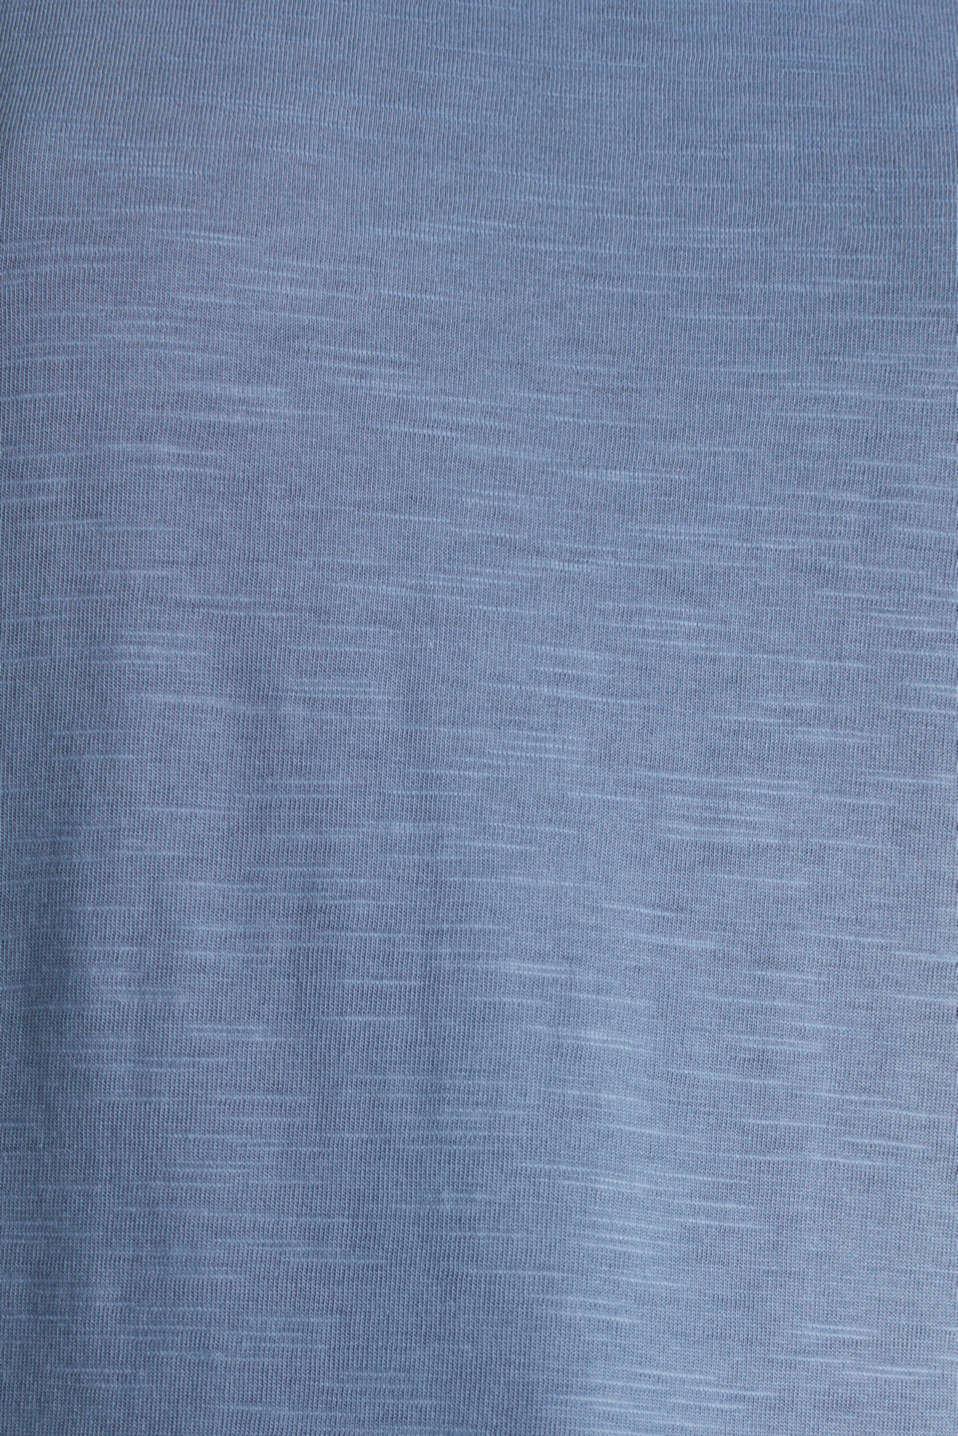 T-Shirts, GREY BLUE 4, detail image number 4